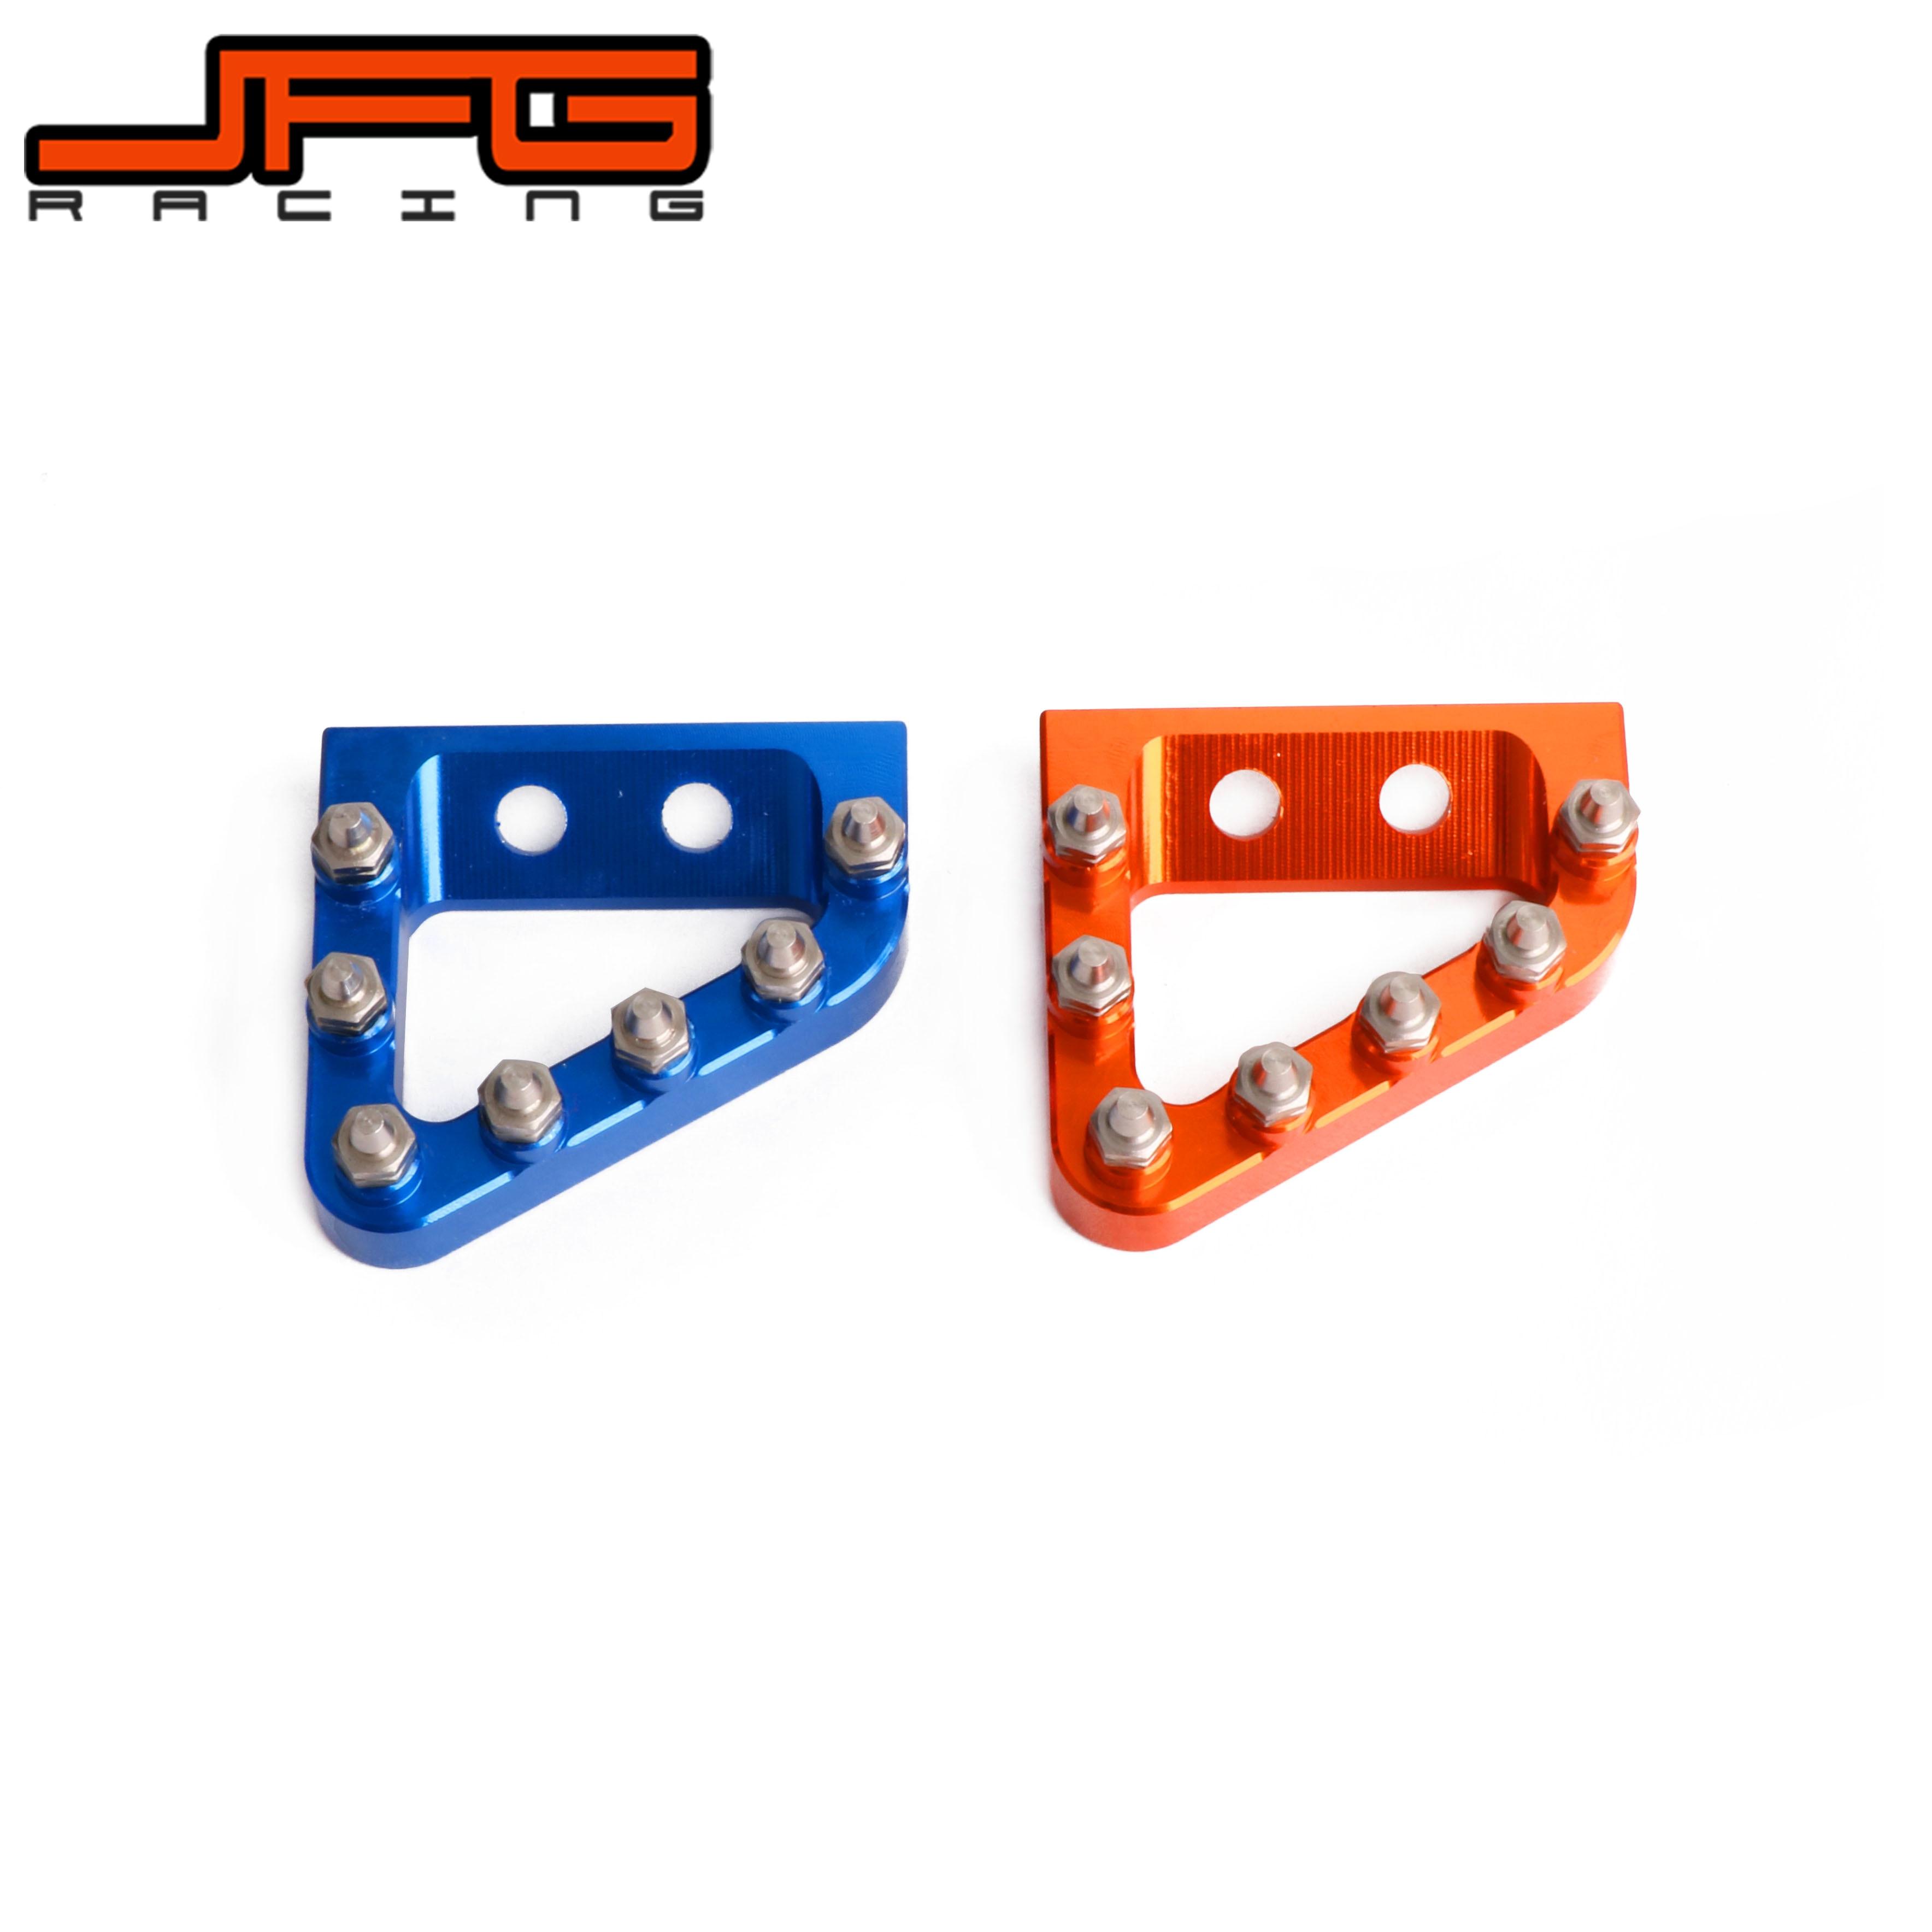 Automotive Motorcycle Brake Pedal Lever Step Plate Tip For KTM 250 ...